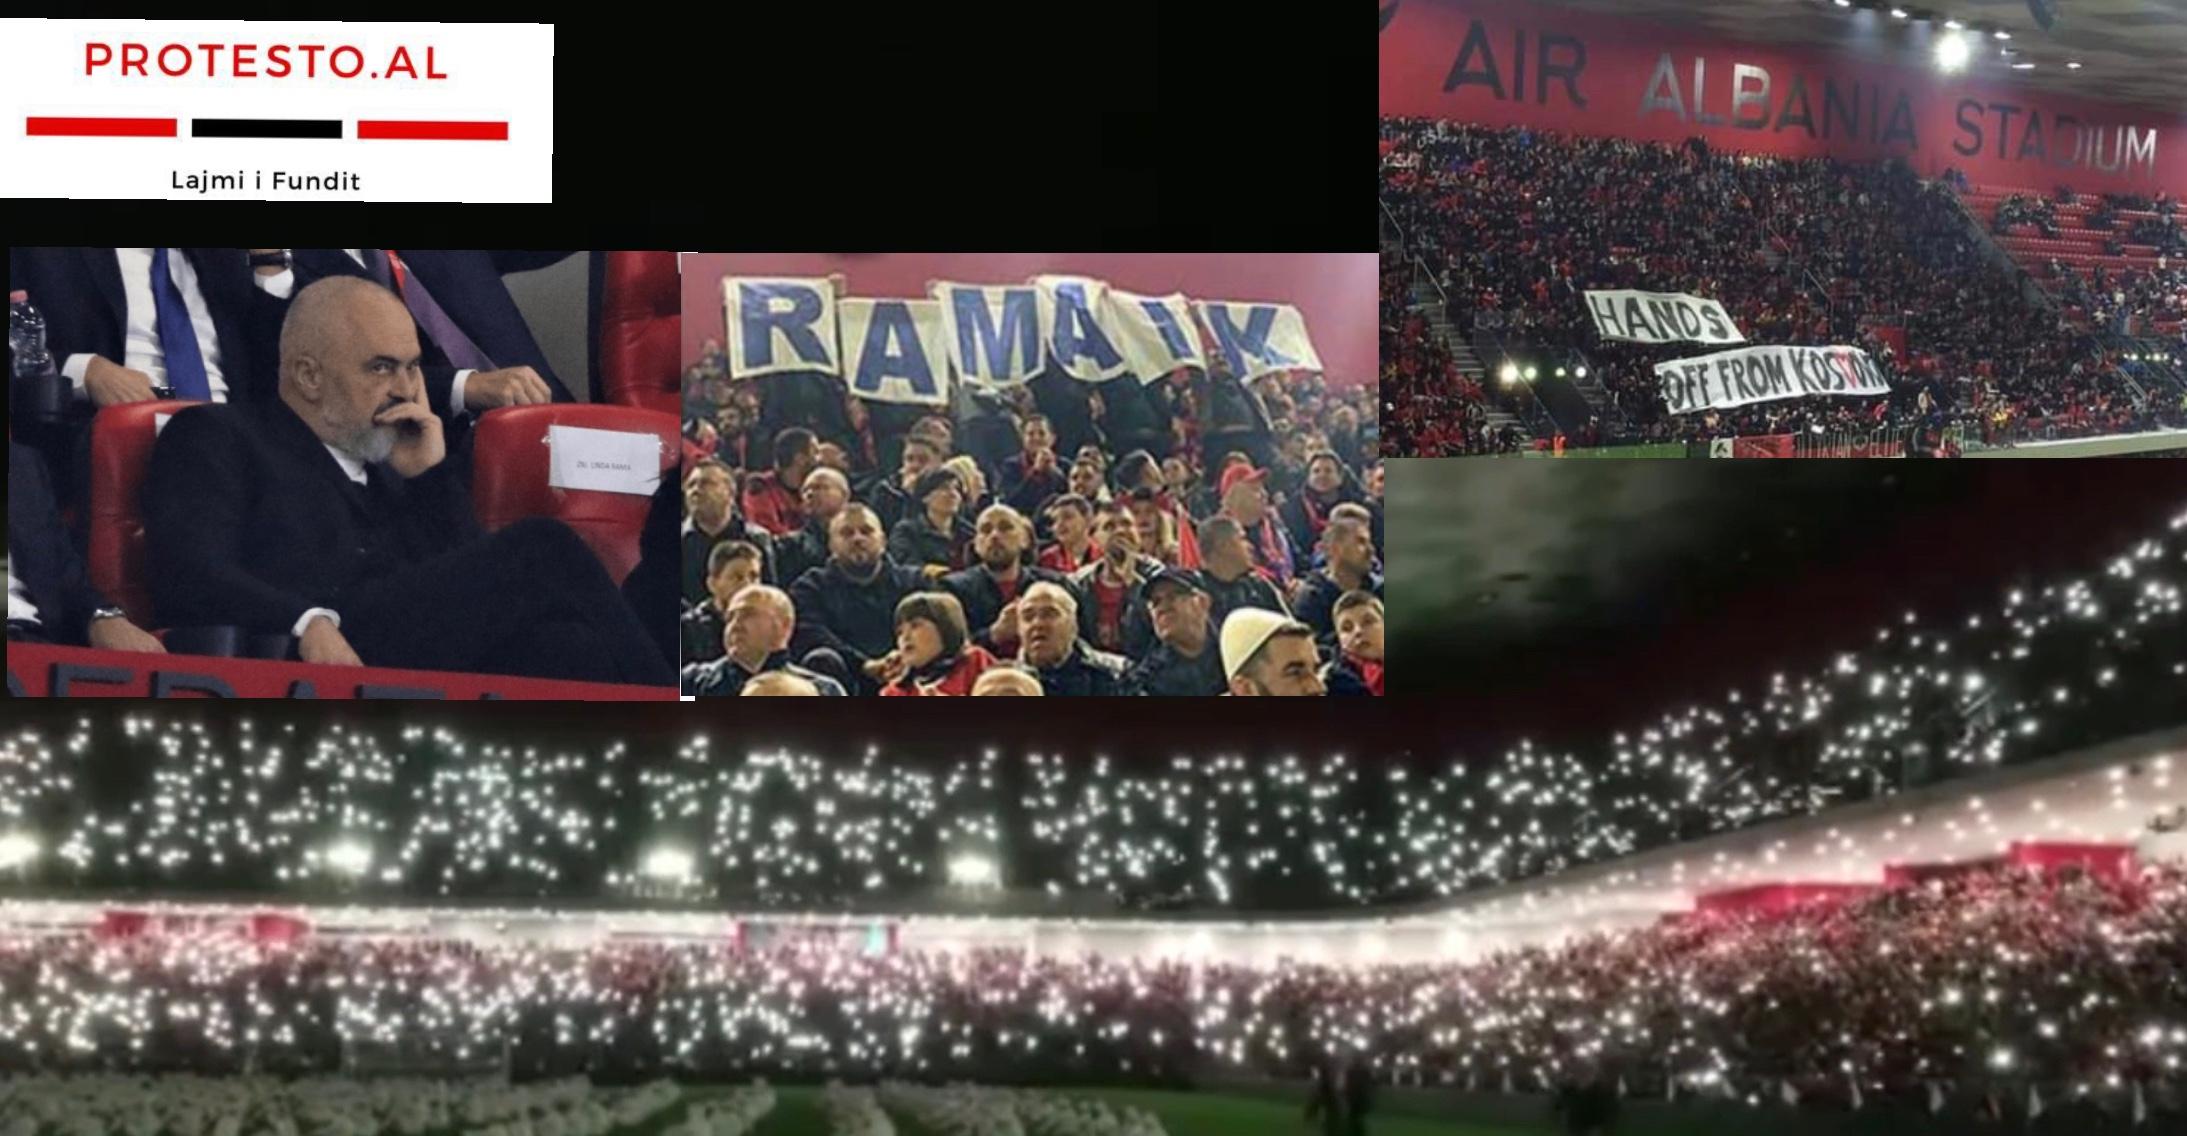 """Air Albania"" I gjithe stadiumi ne kembe 'Rama ik' ringjall shpresën kunder sistemit marksist"